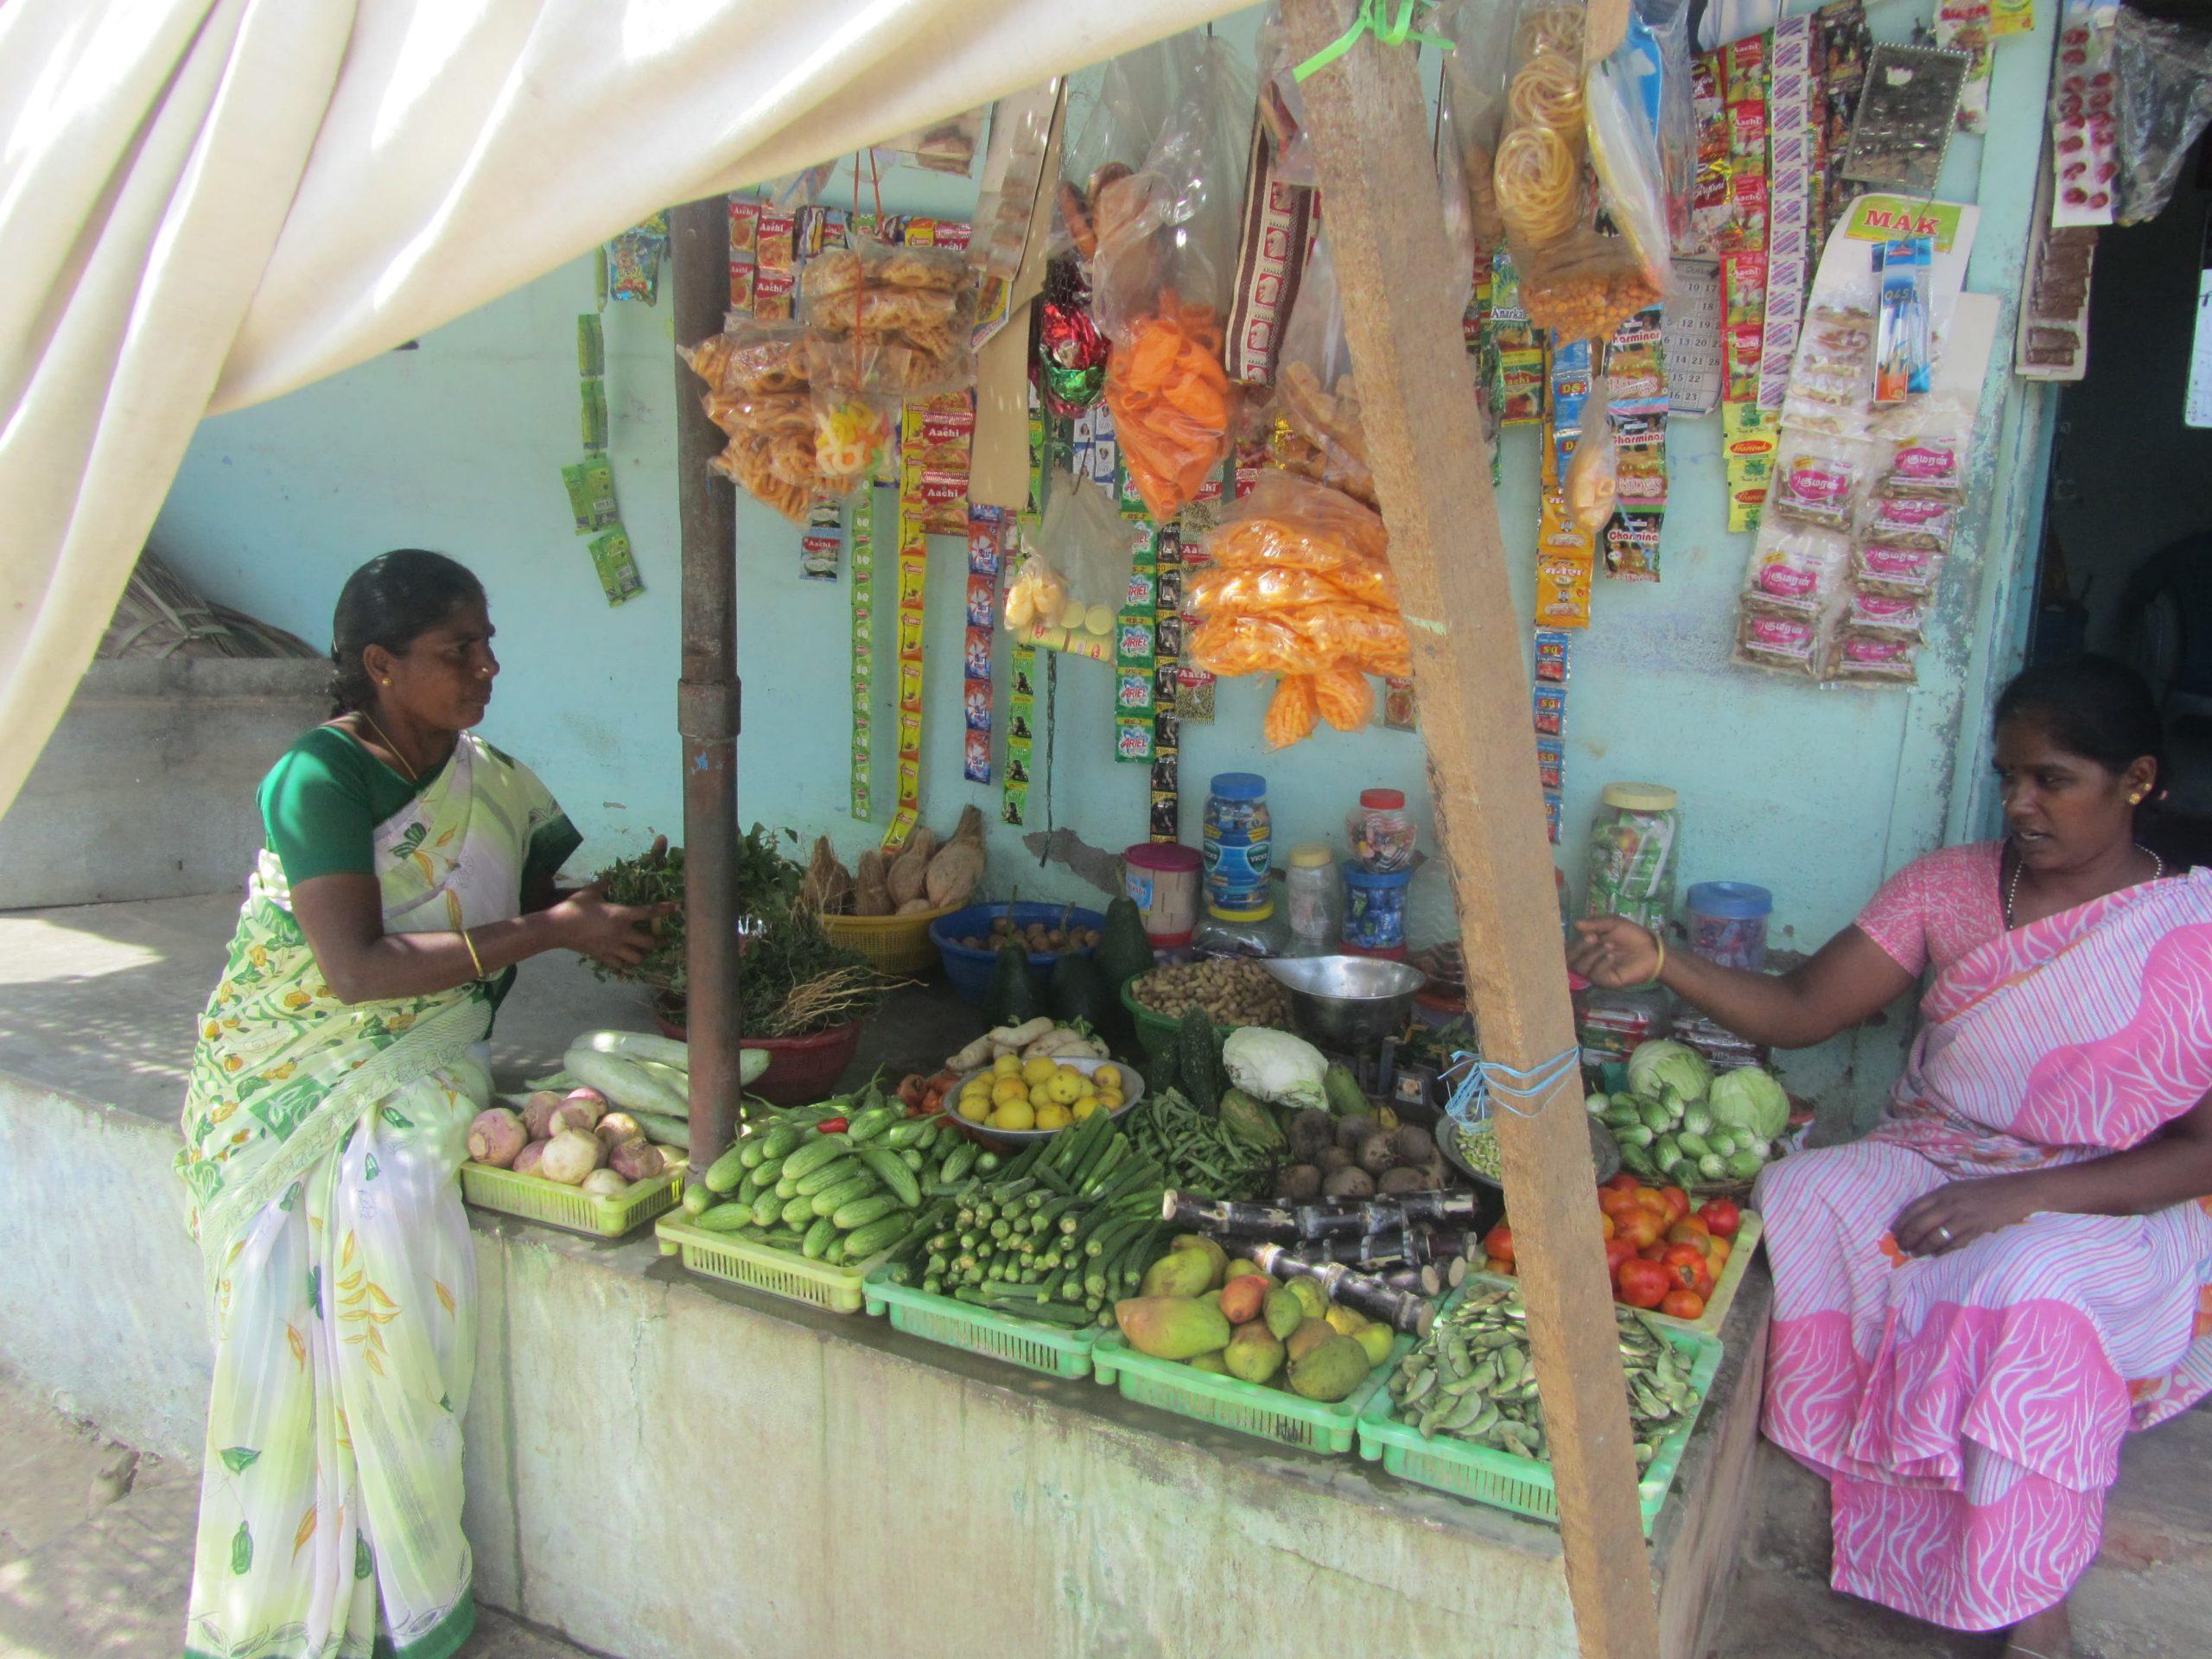 Small loans bring simple joy